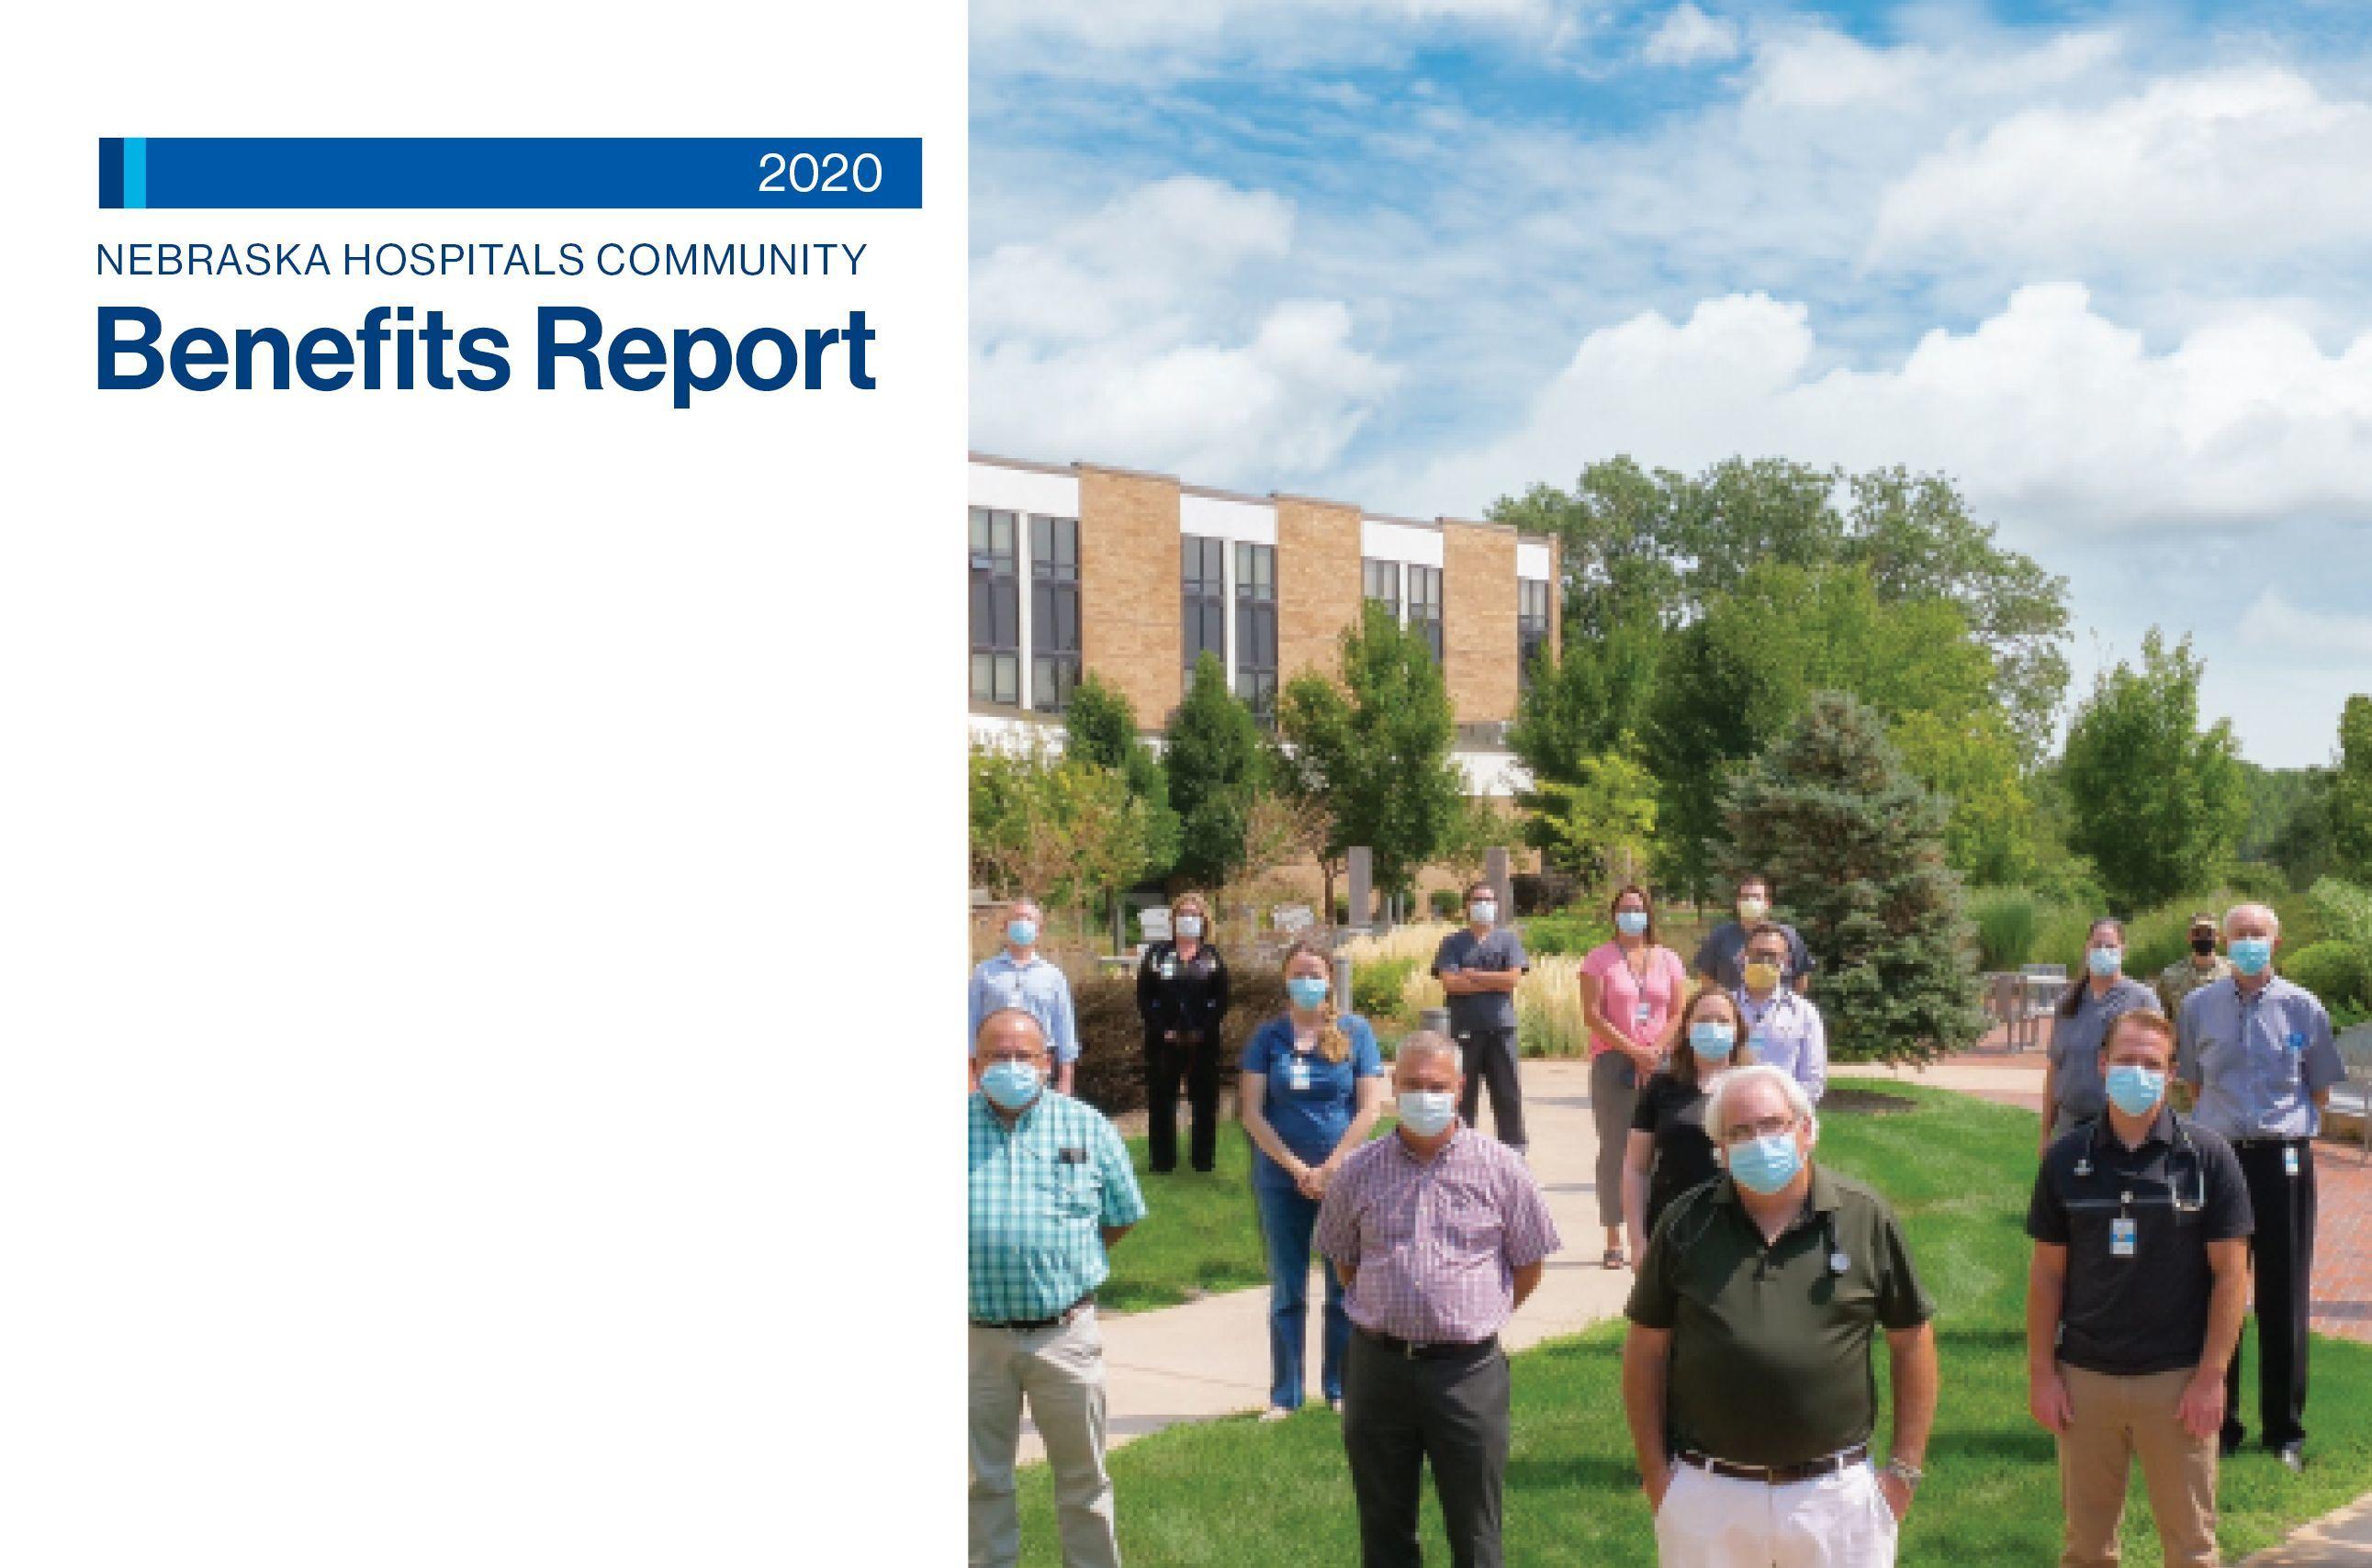 2020 Community Benefits Report